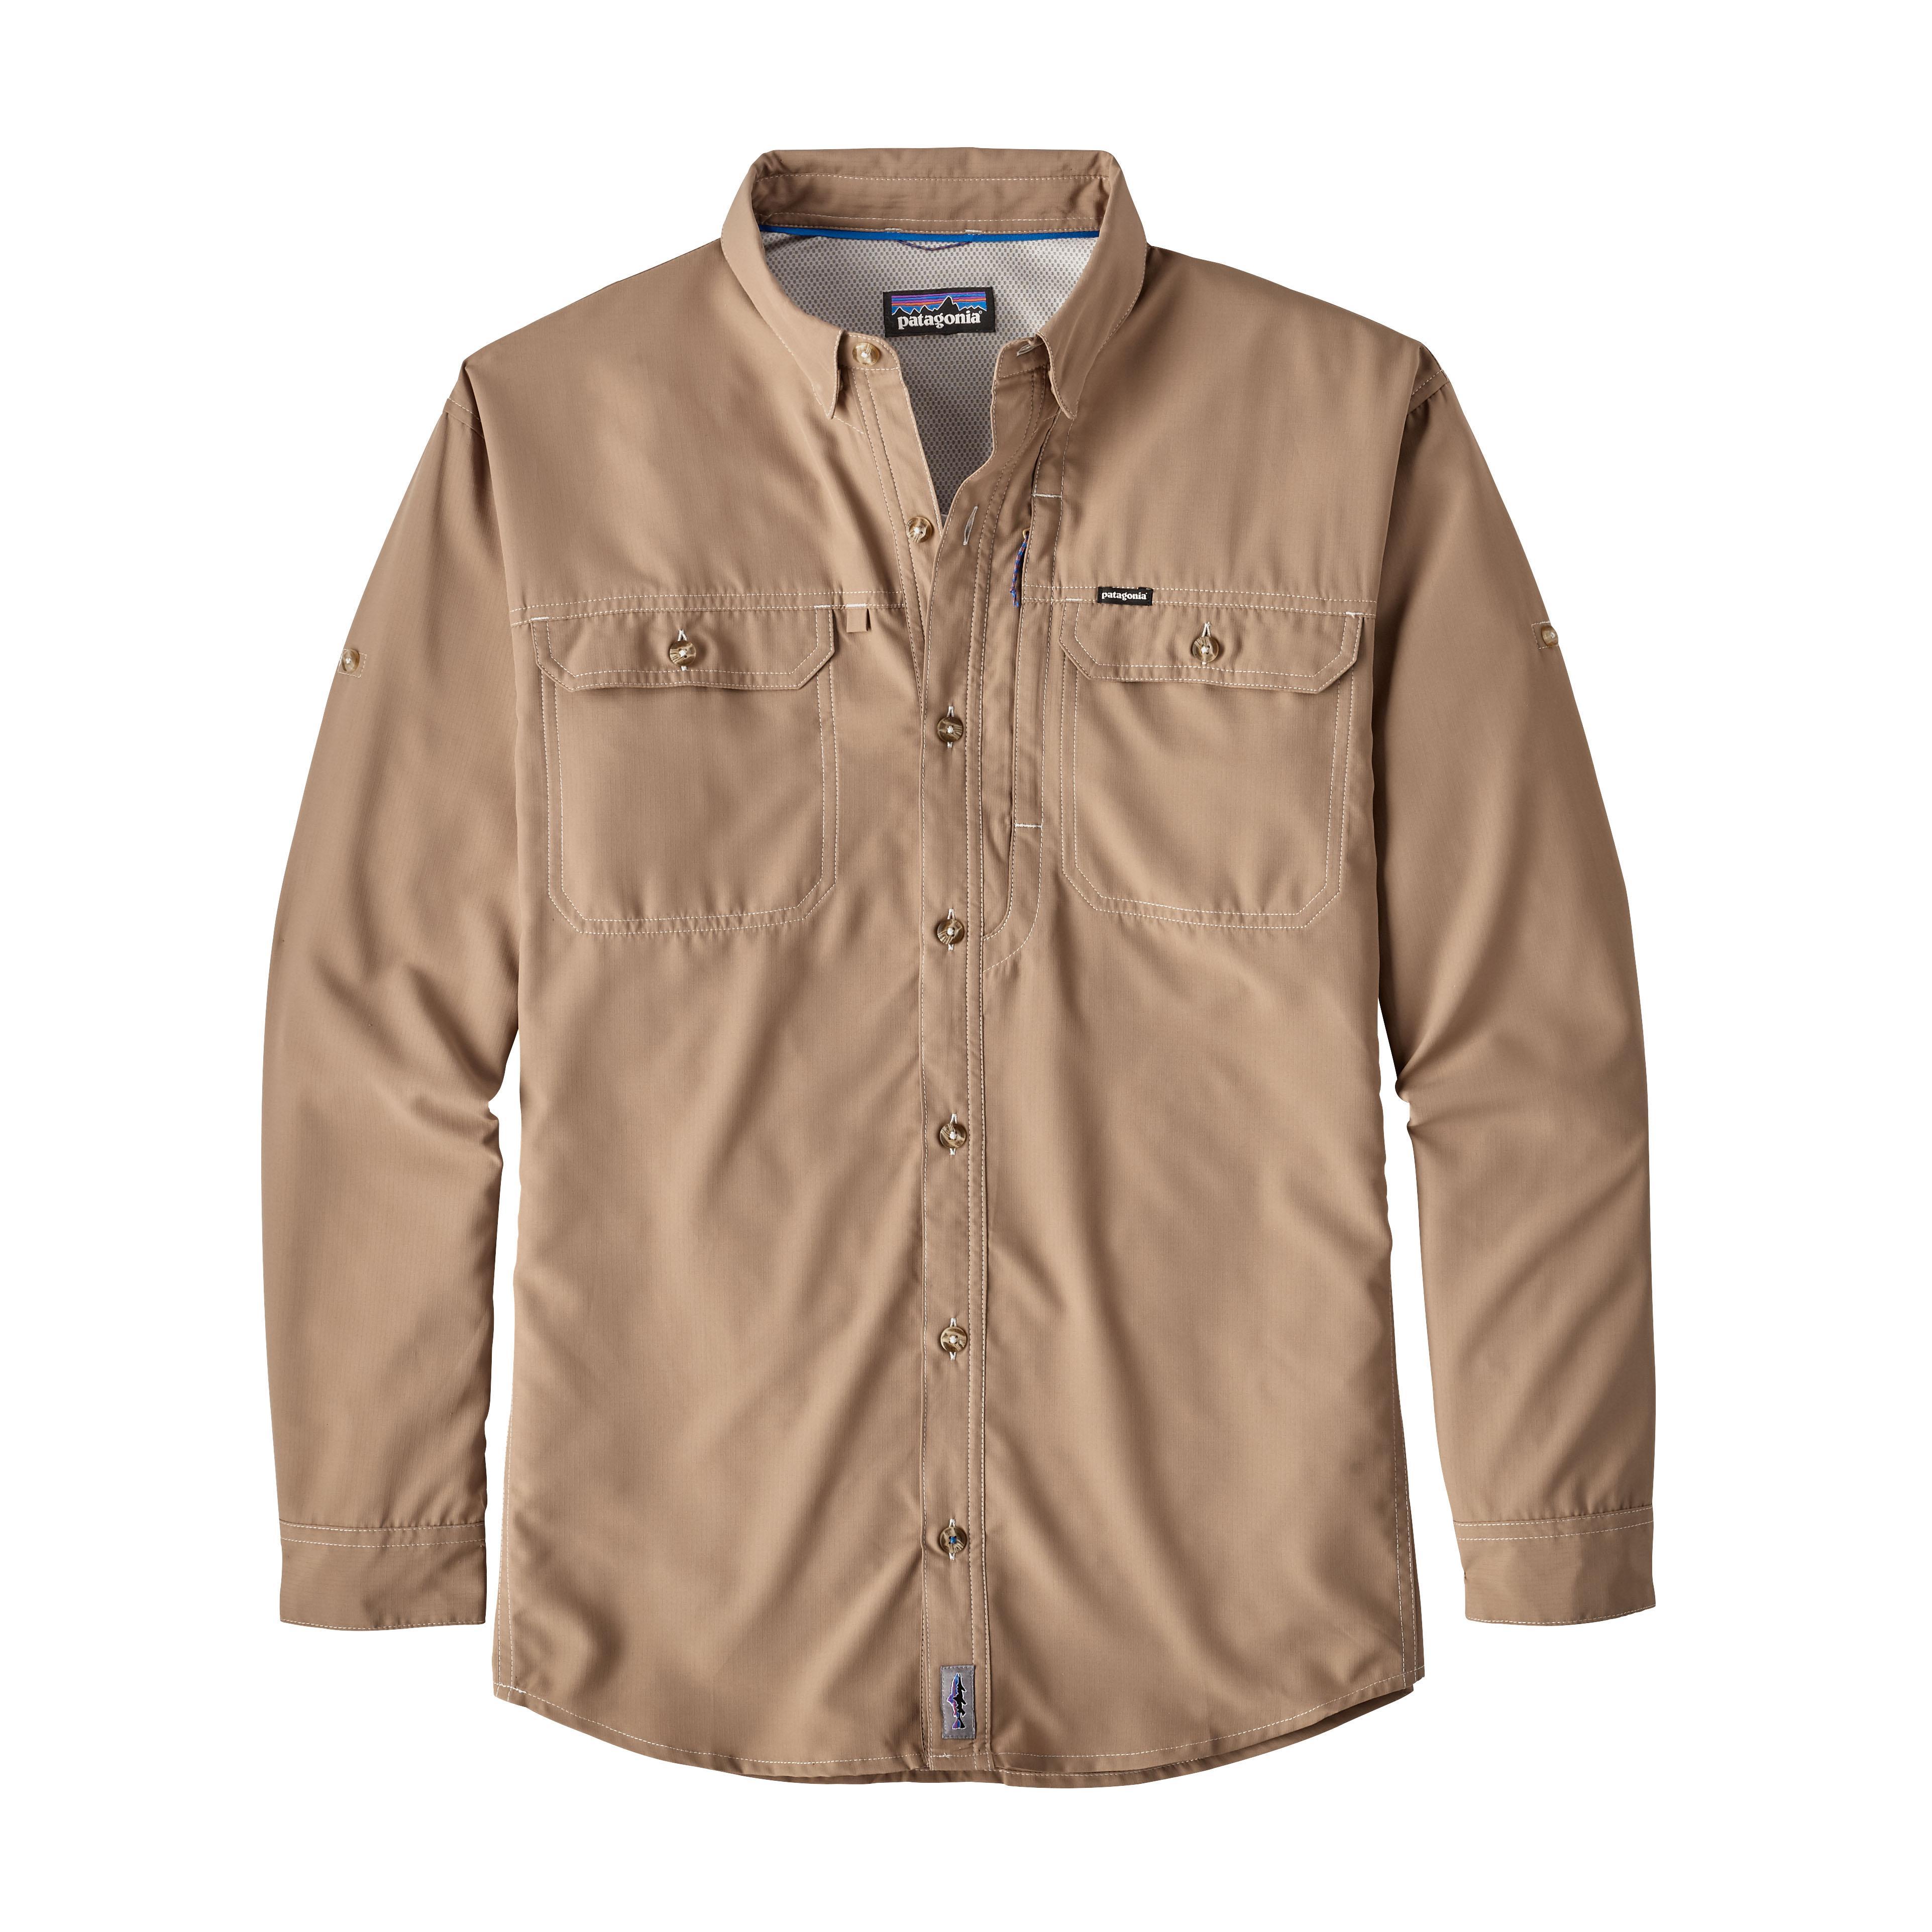 Patagonia Men's Sol Patrol L/S Shirt MJVK_KHAKI